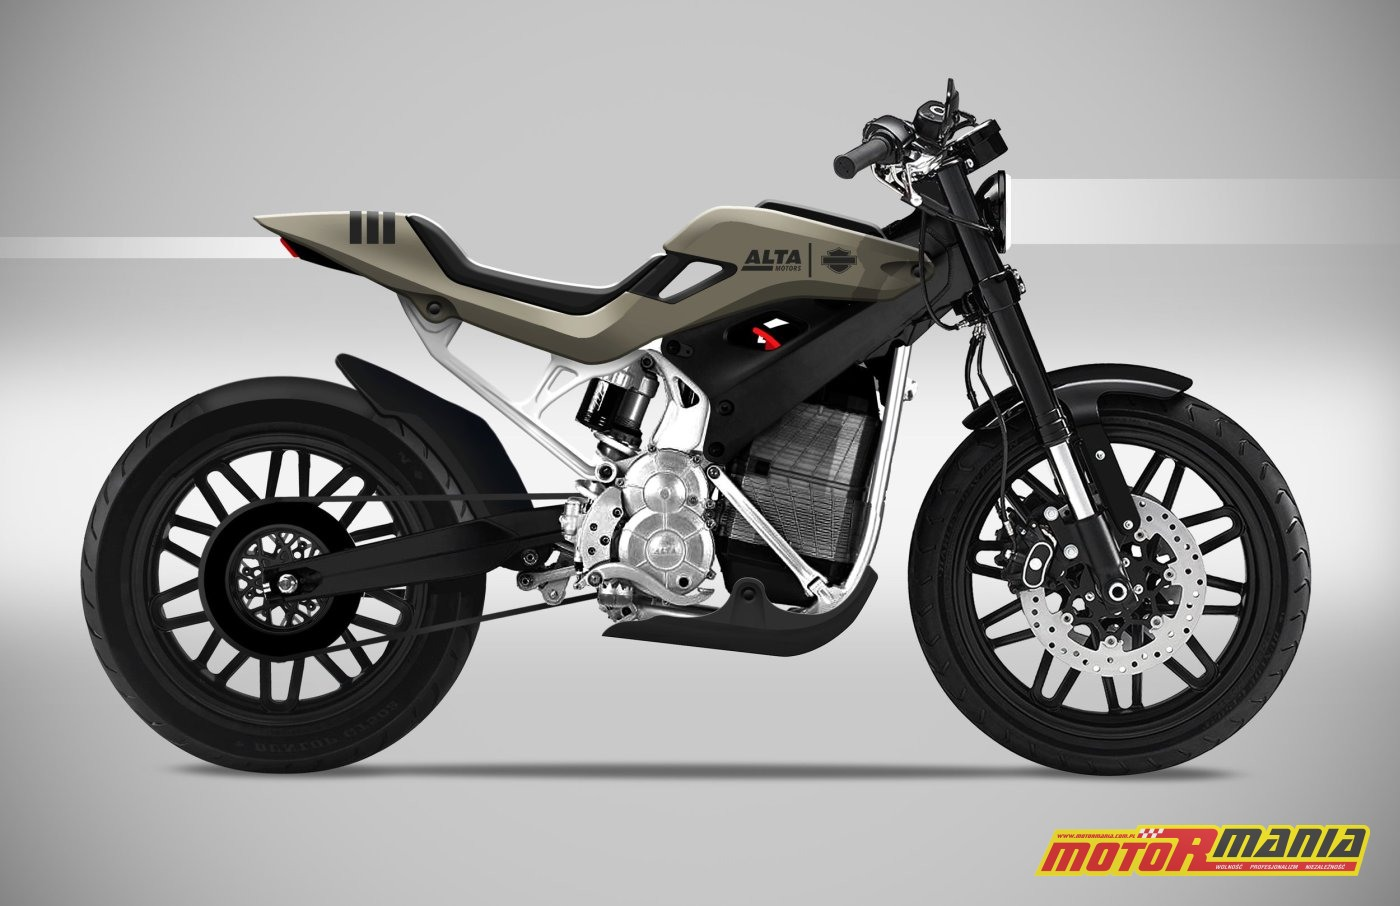 Street Tracker Concept od Carbon Project - Harley i Alta Motors